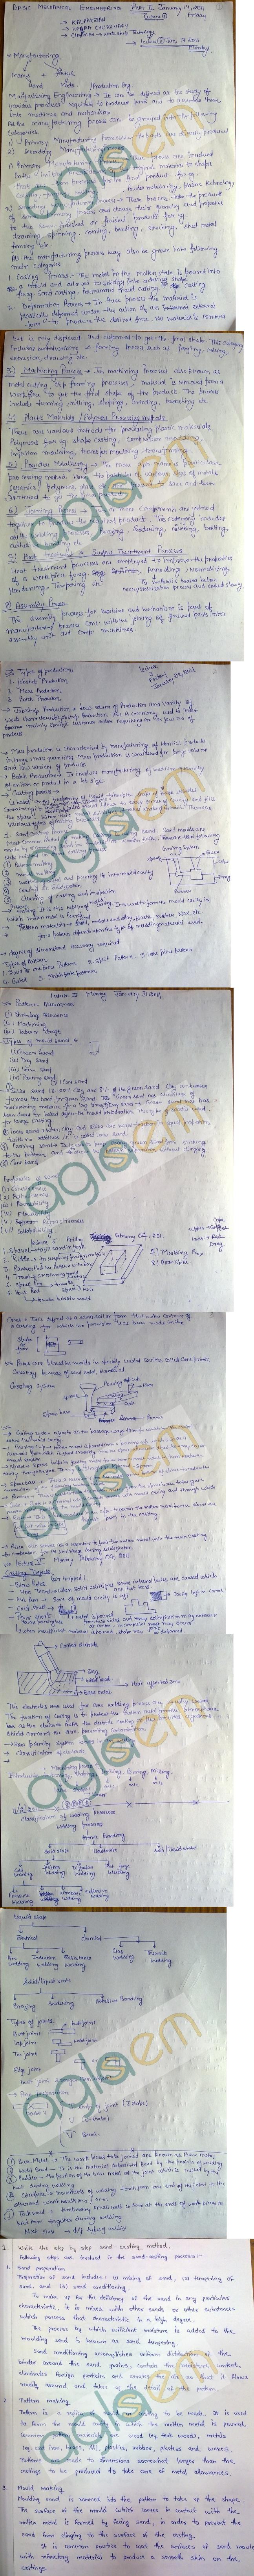 DTU Notes - 1 Year APAC - Composite Materials